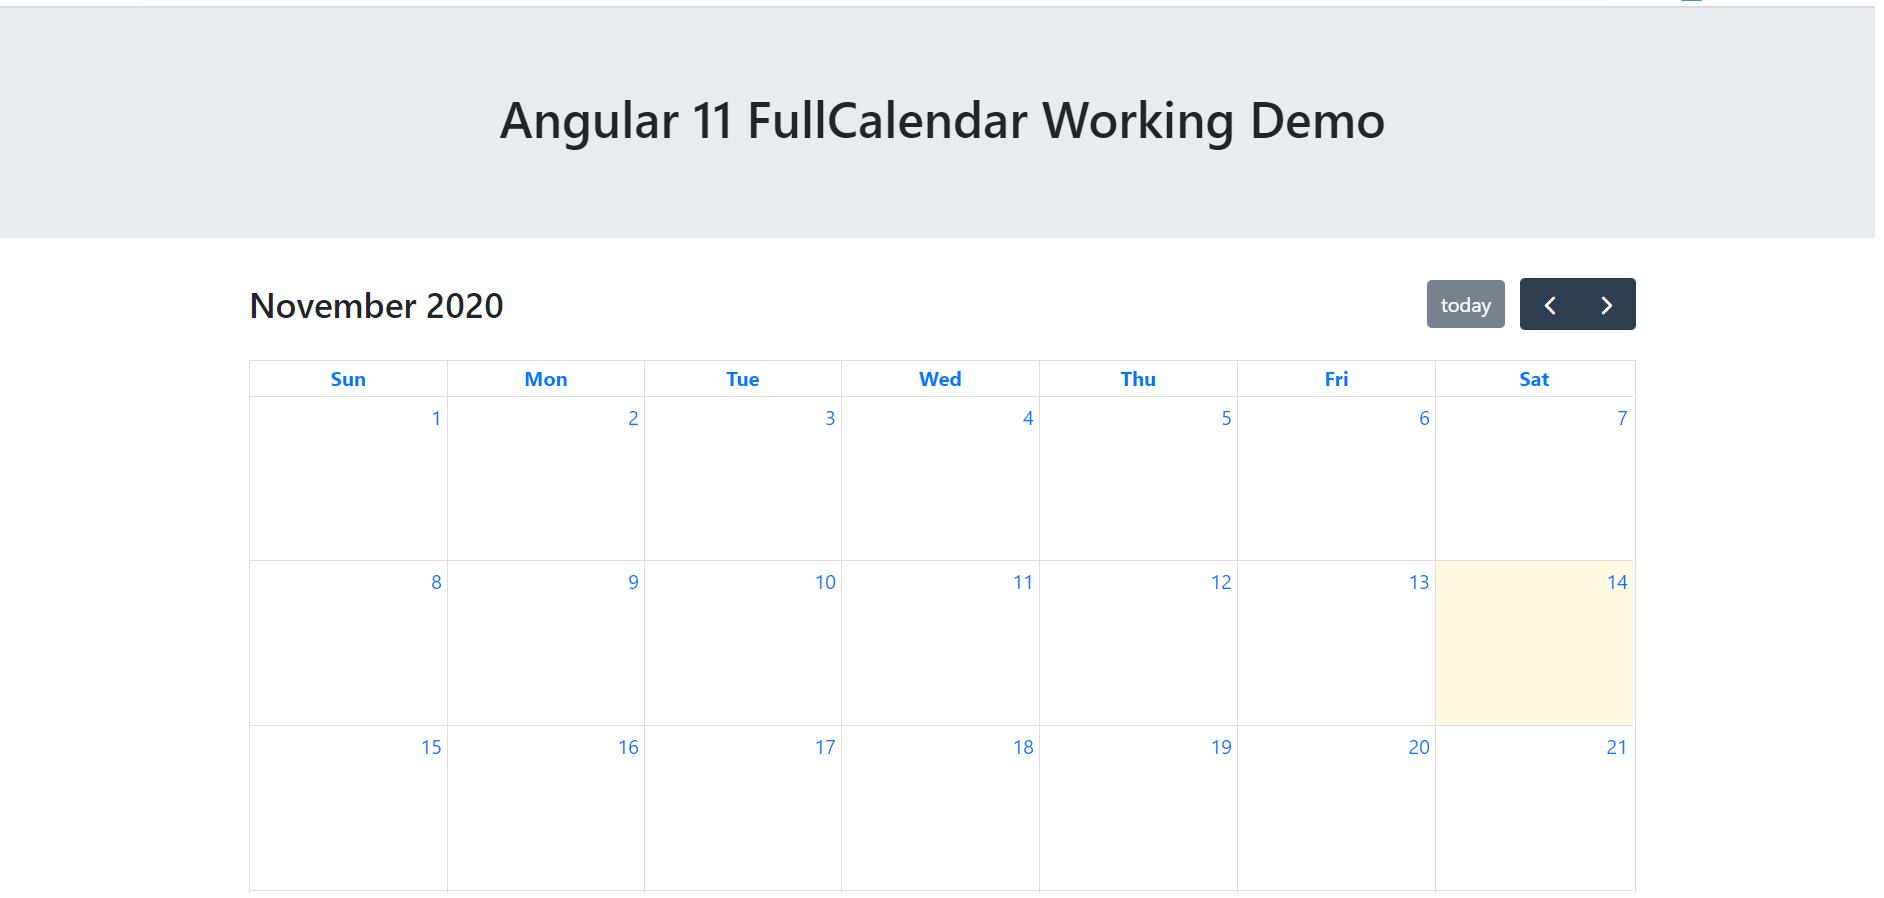 Angular 11 FullCalendar Working Demo